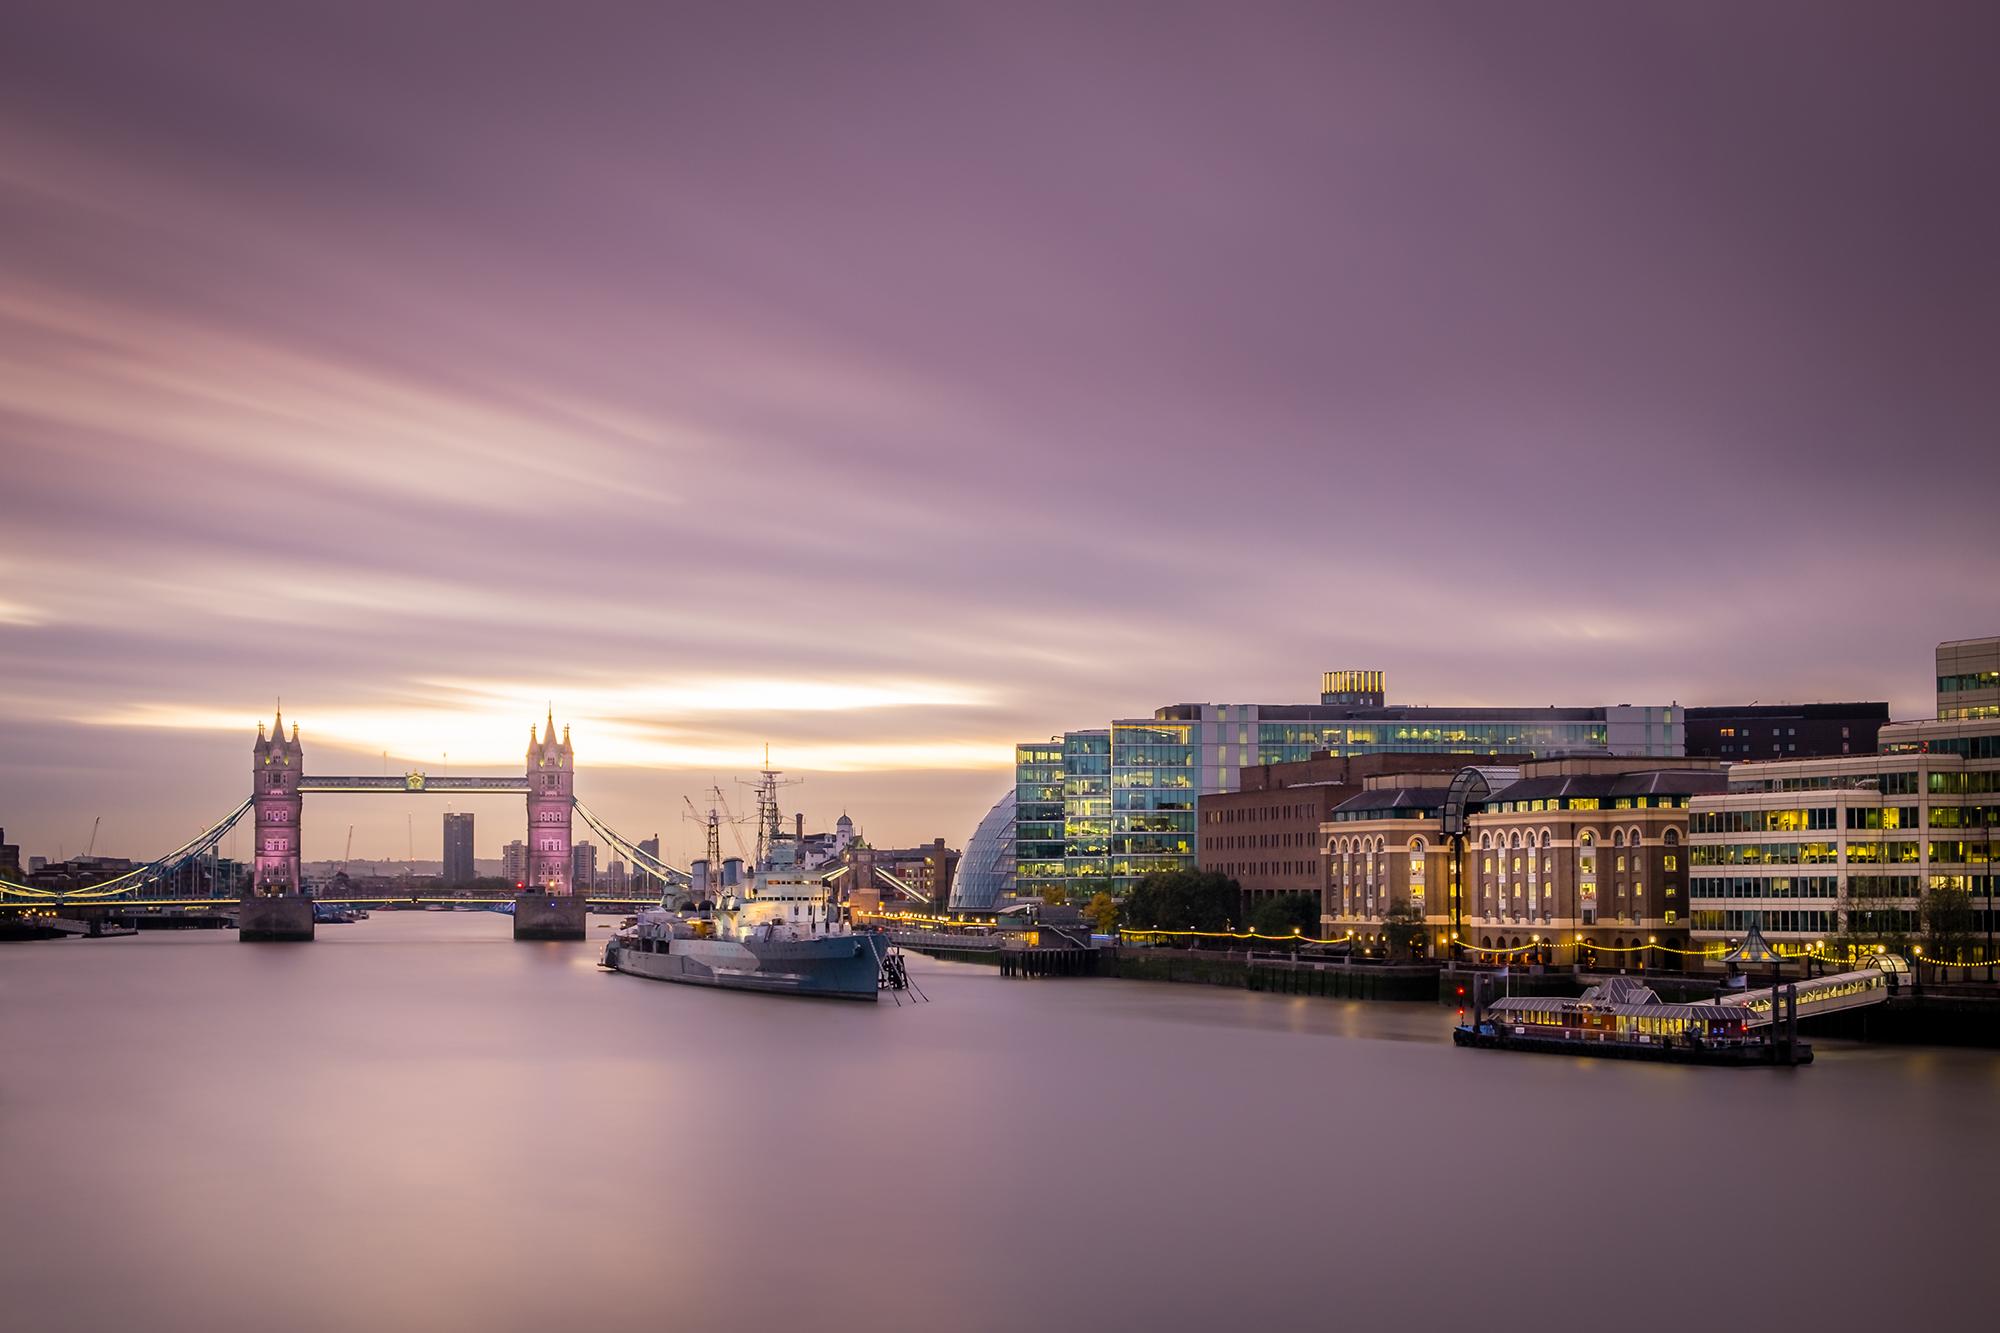 Long Exposure of Tower Bridge at sunrise taken by Trevor Sherwin